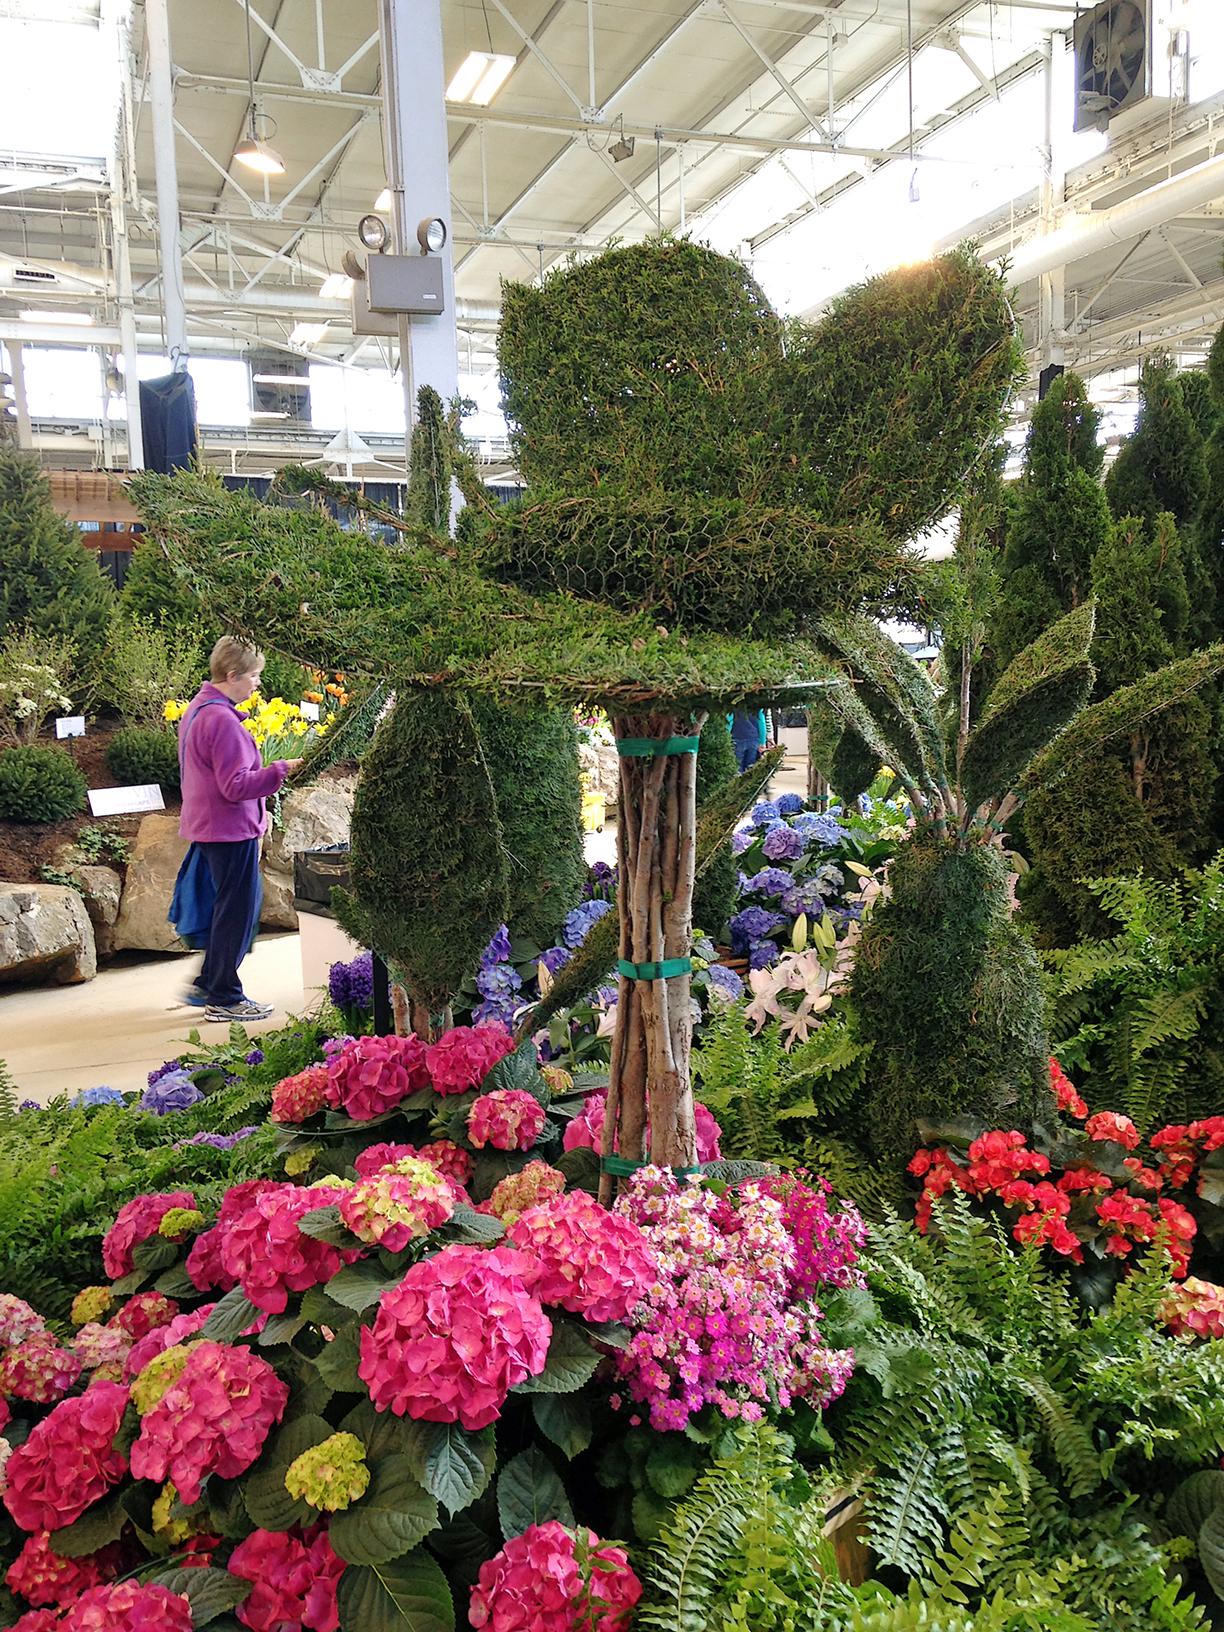 Indiana Flower and Patio Show 2015 Mini exhibit